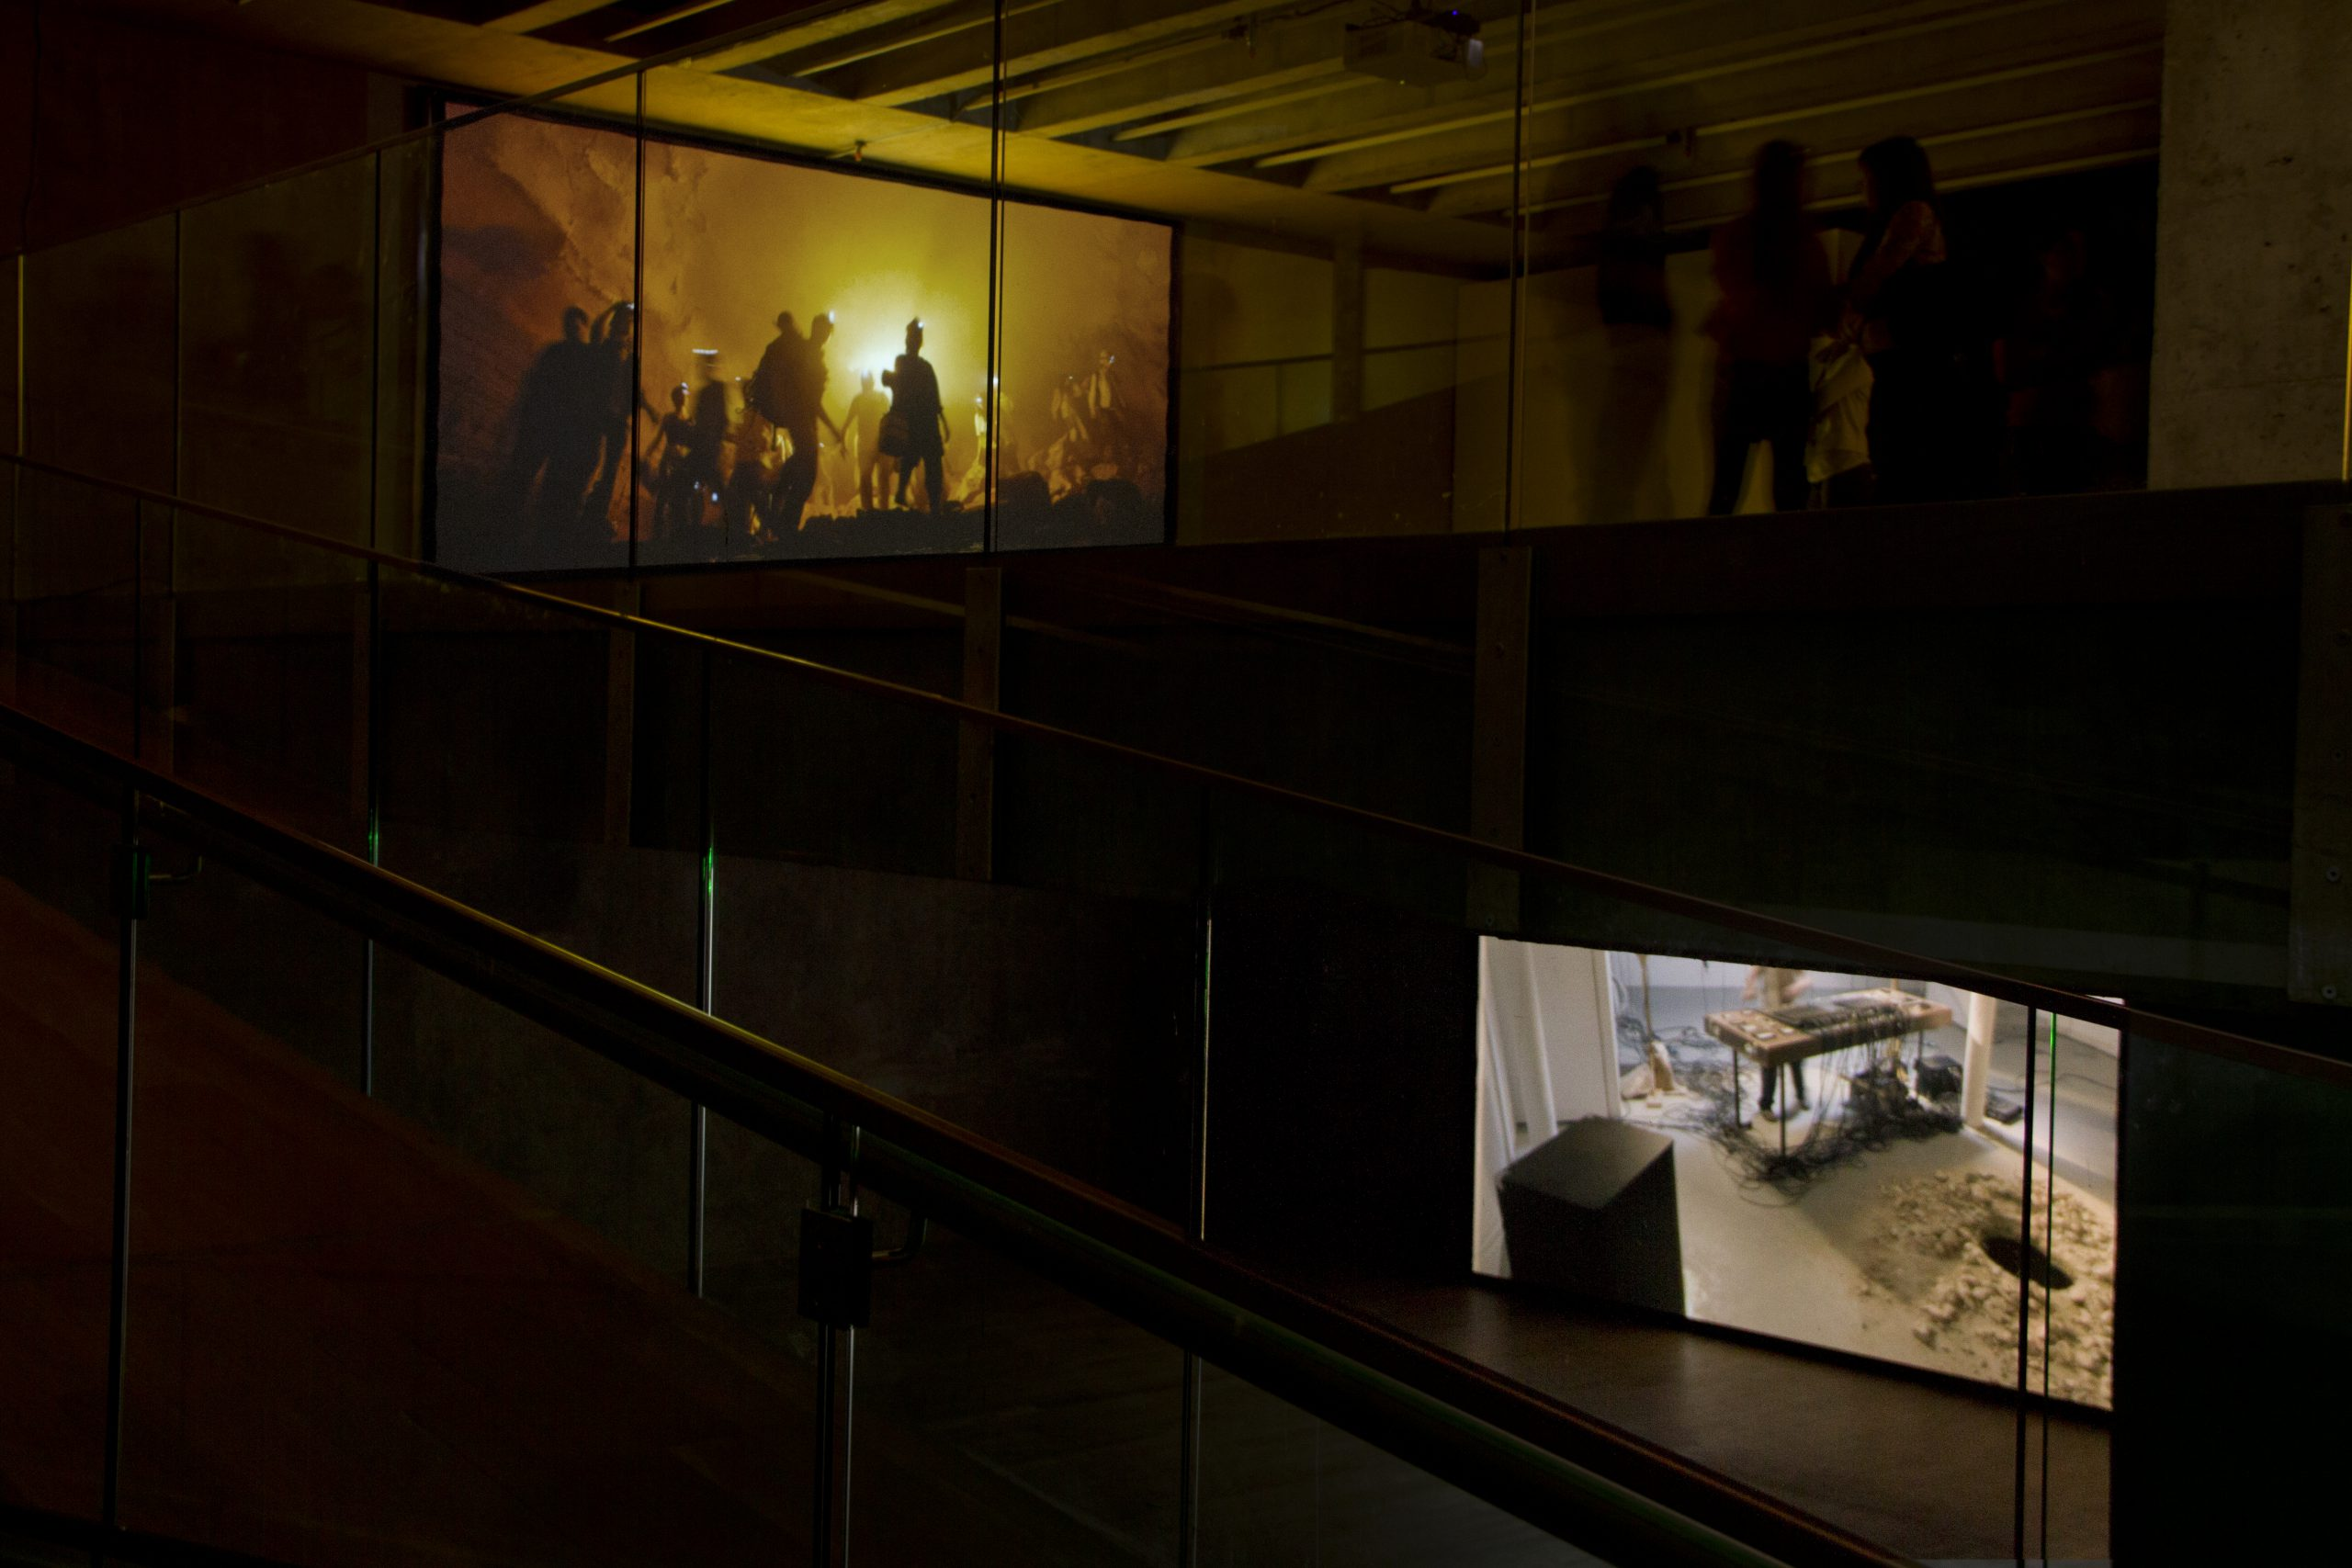 Gilad Ratman, The Workshop, Installation View, MACBA, 2014